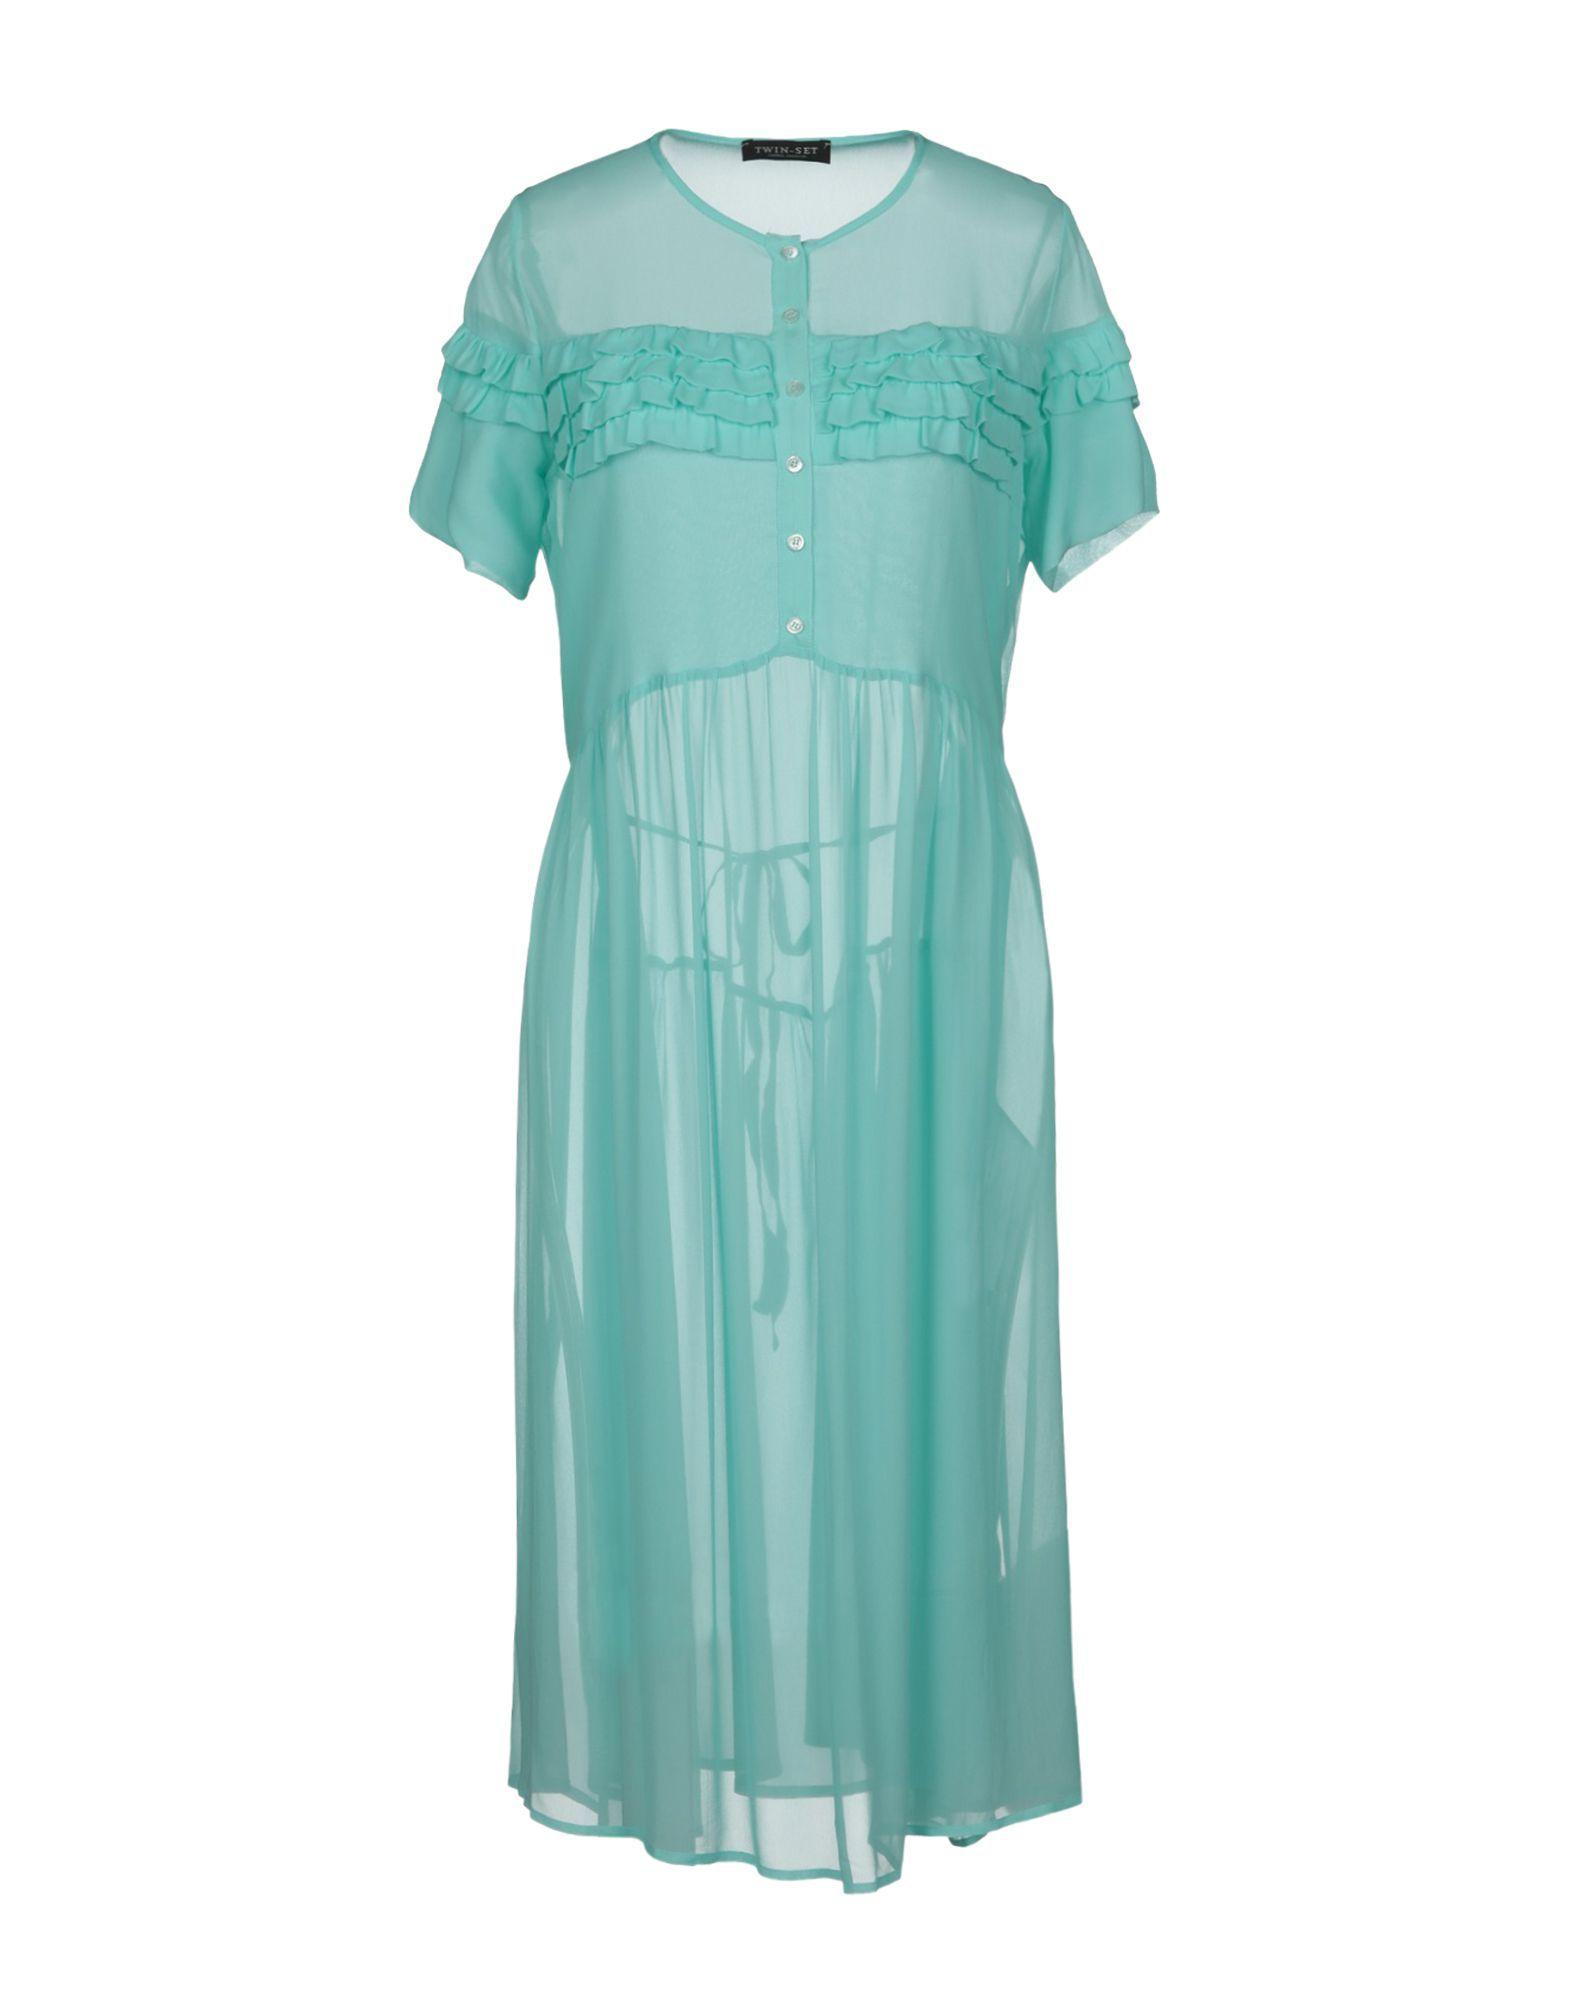 Twinset Turquoise Crepe Shirt Dress